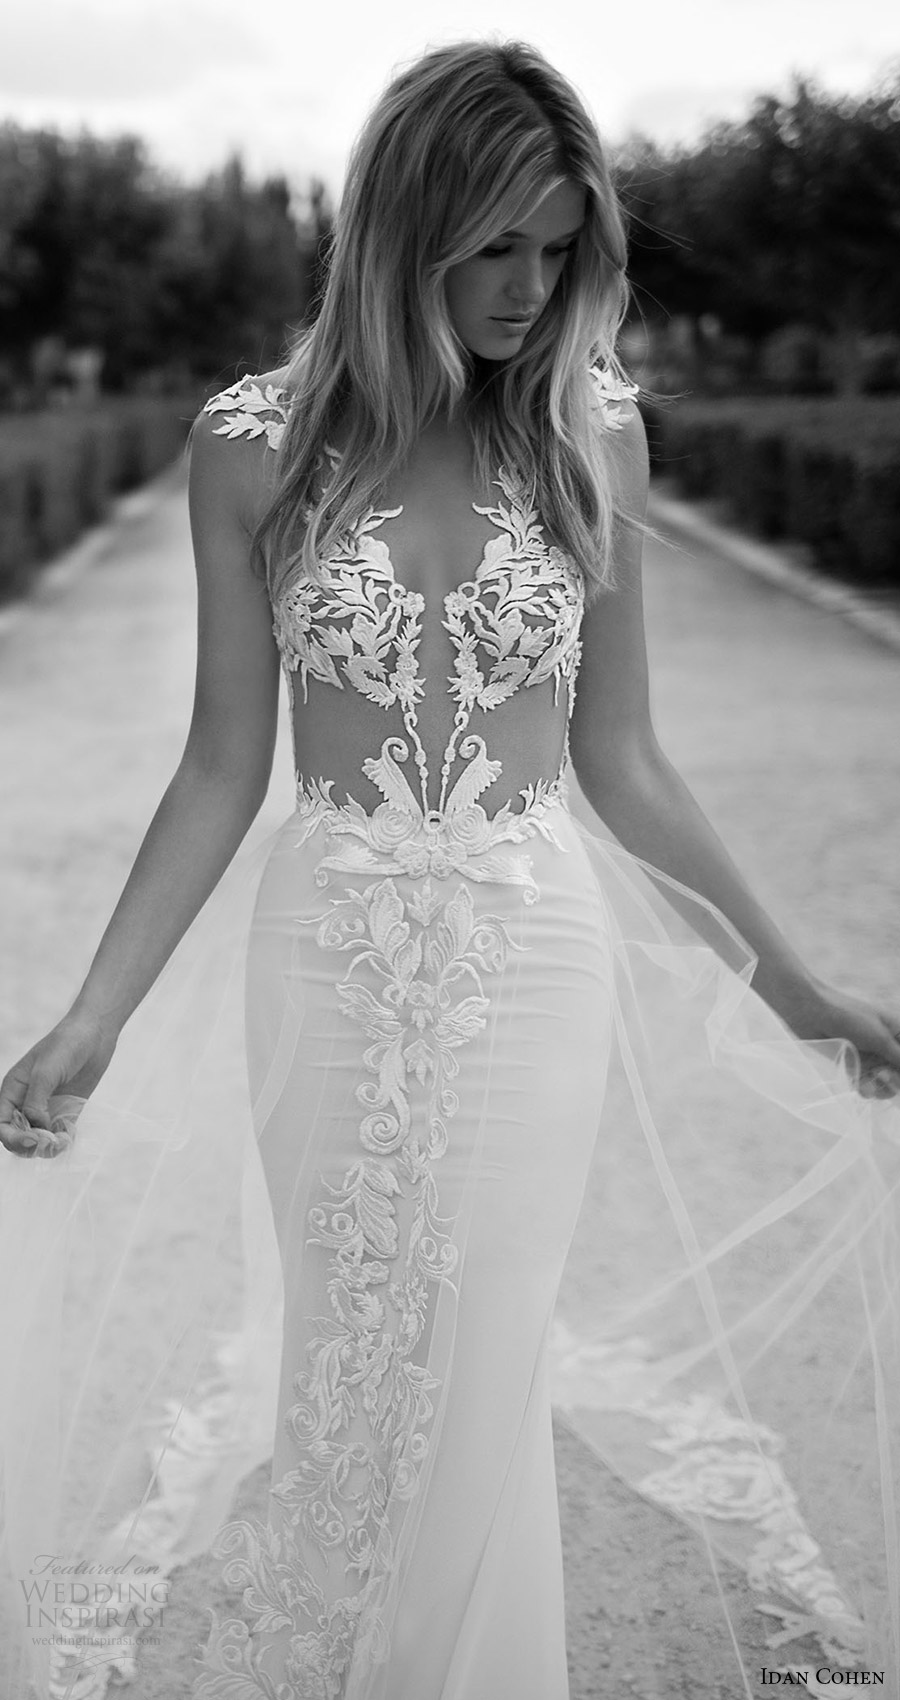 vestido de novia de la envoltura del cordón profundo vneck 2017 manga del casquillo de novia Idan Cohen (Violette) ZFV tren